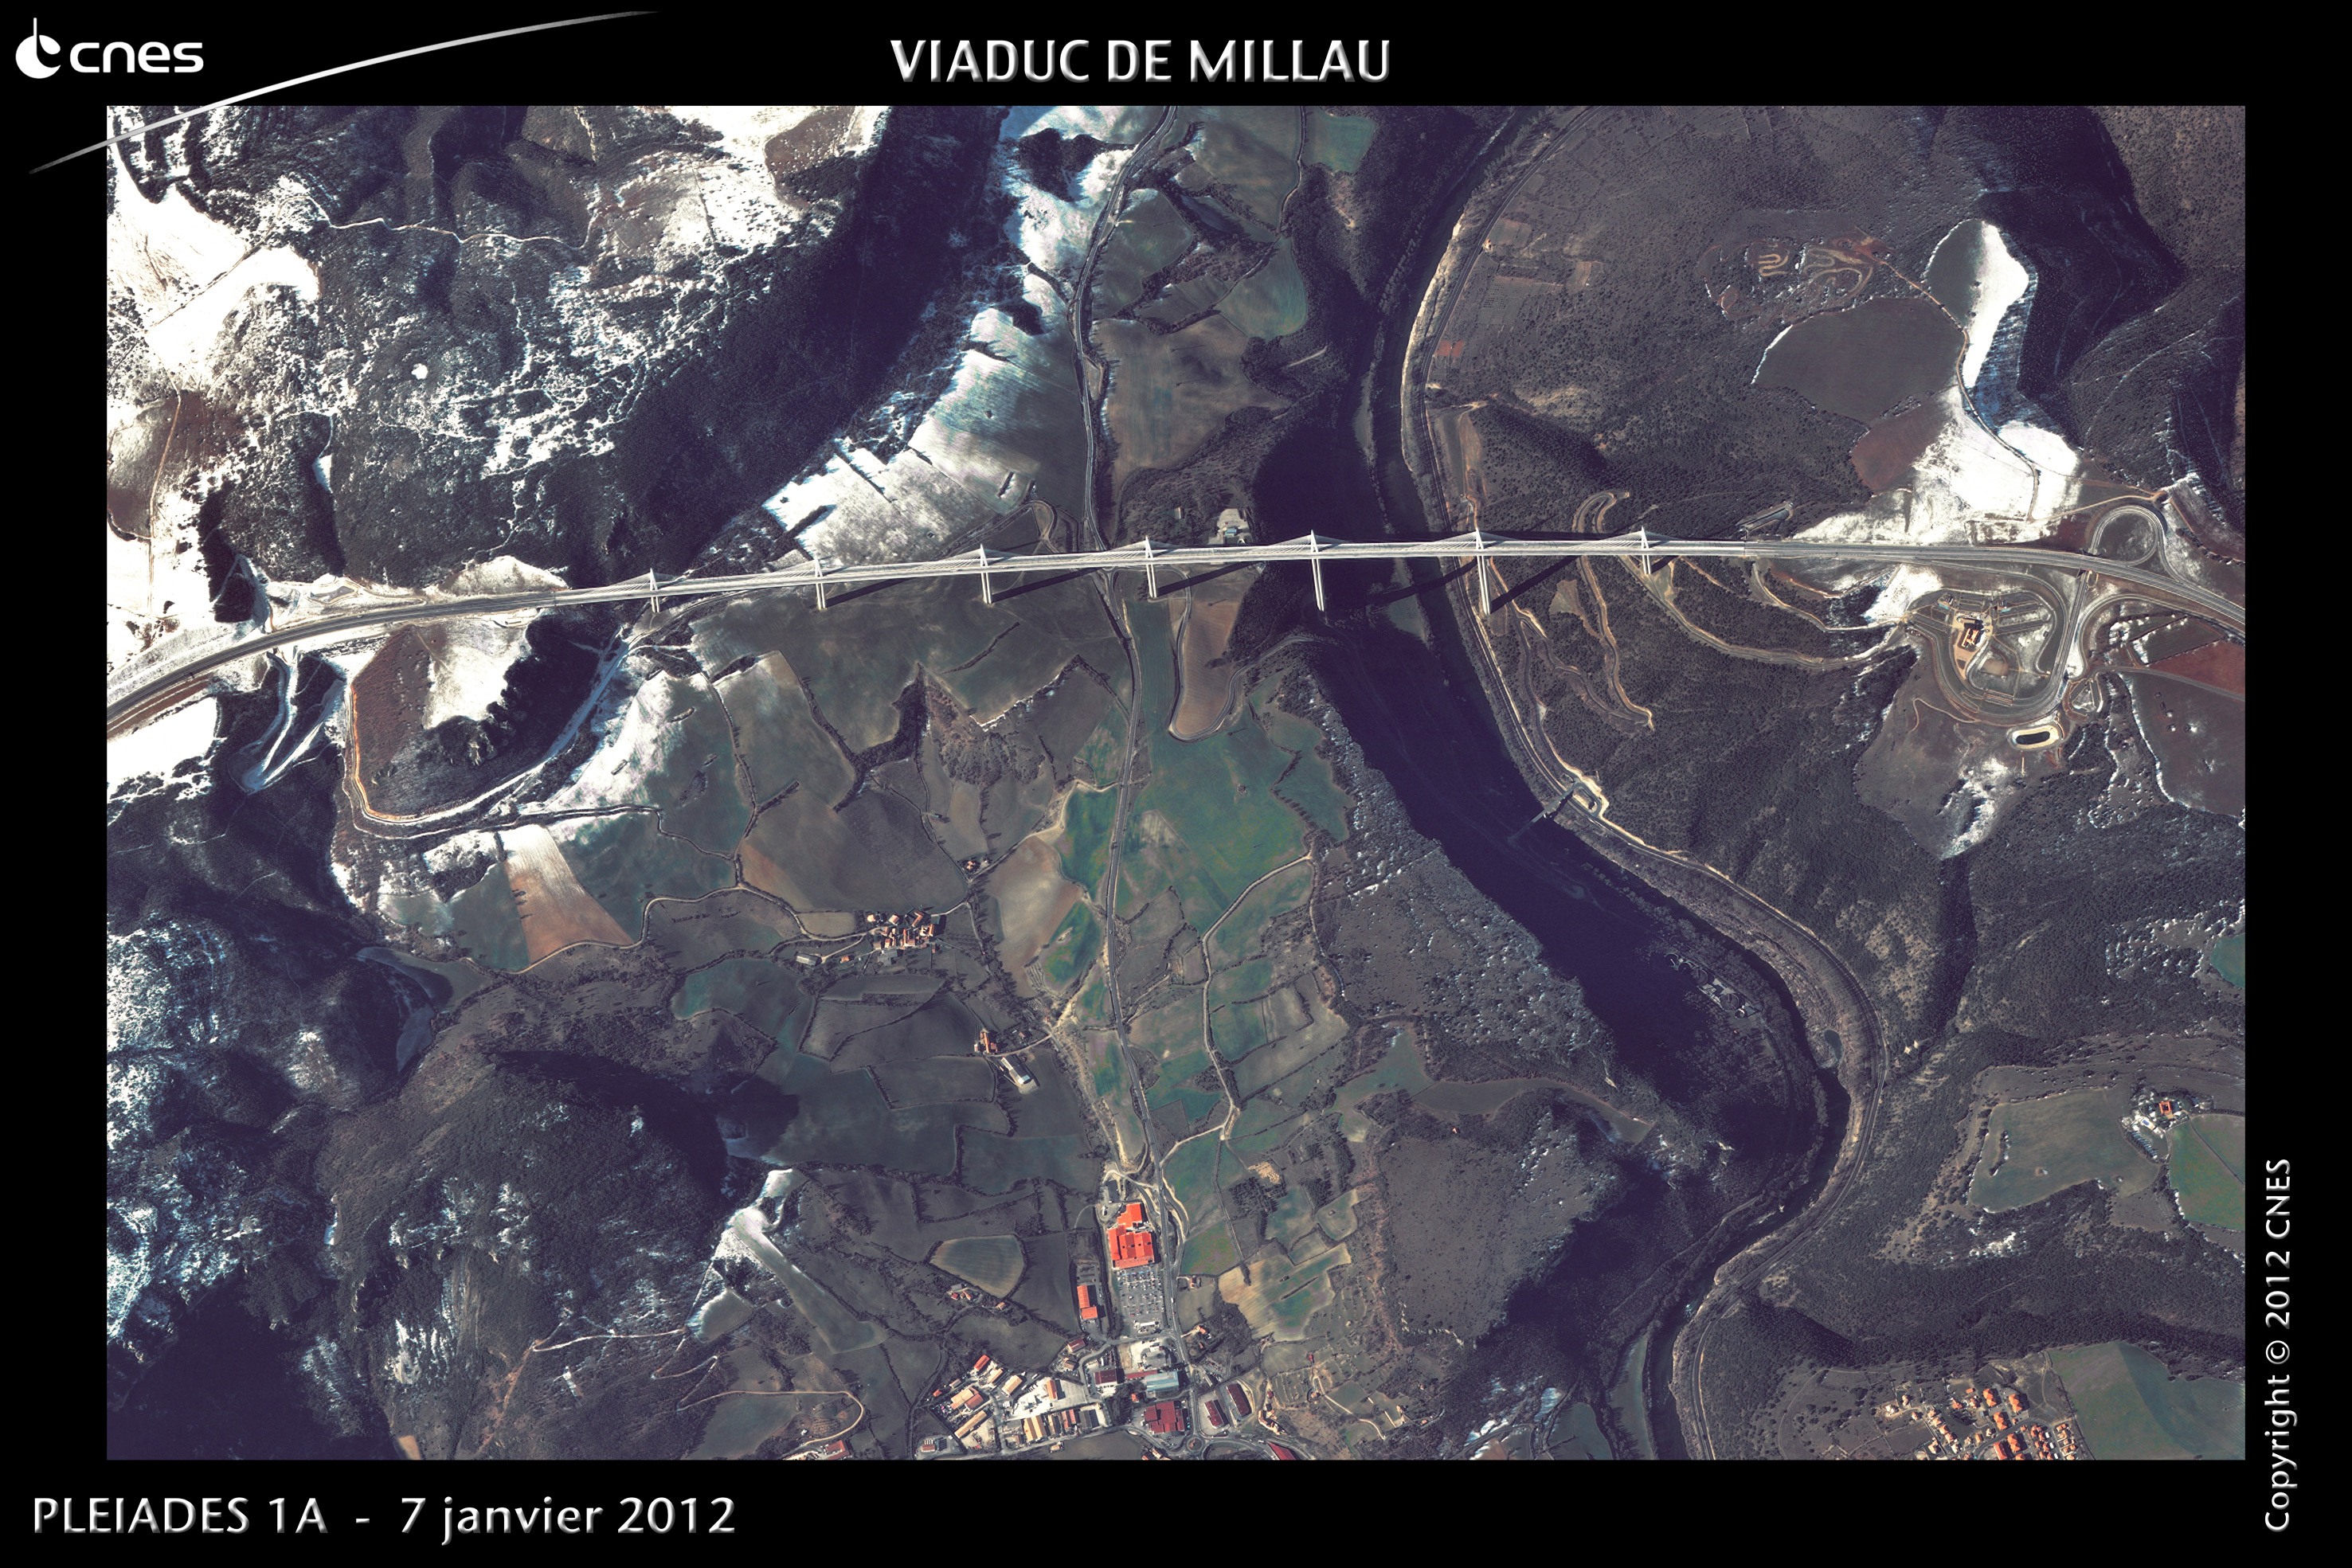 382-Poster_Viaduc_de_Millau-p.jpg